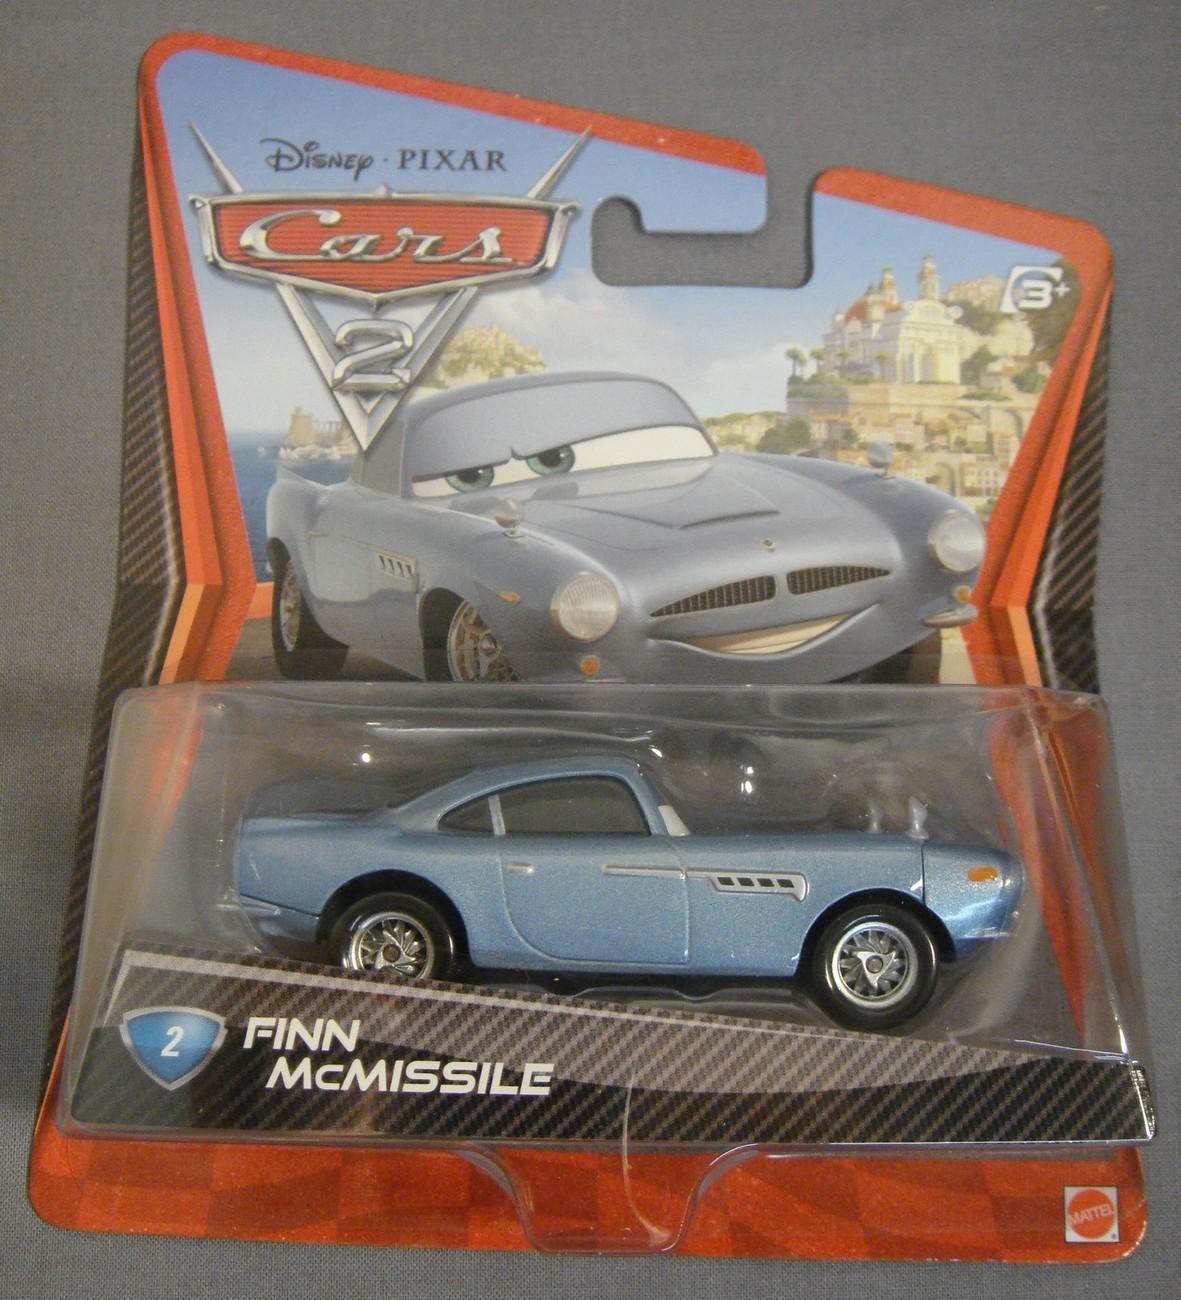 Finn Mcmissile Giocattolo Mattel Disney 1 55 Cars Auto: DISNEY PIXAR CARS 2 FINN McMISSILE #2 MATTEL 1:55 SCALE